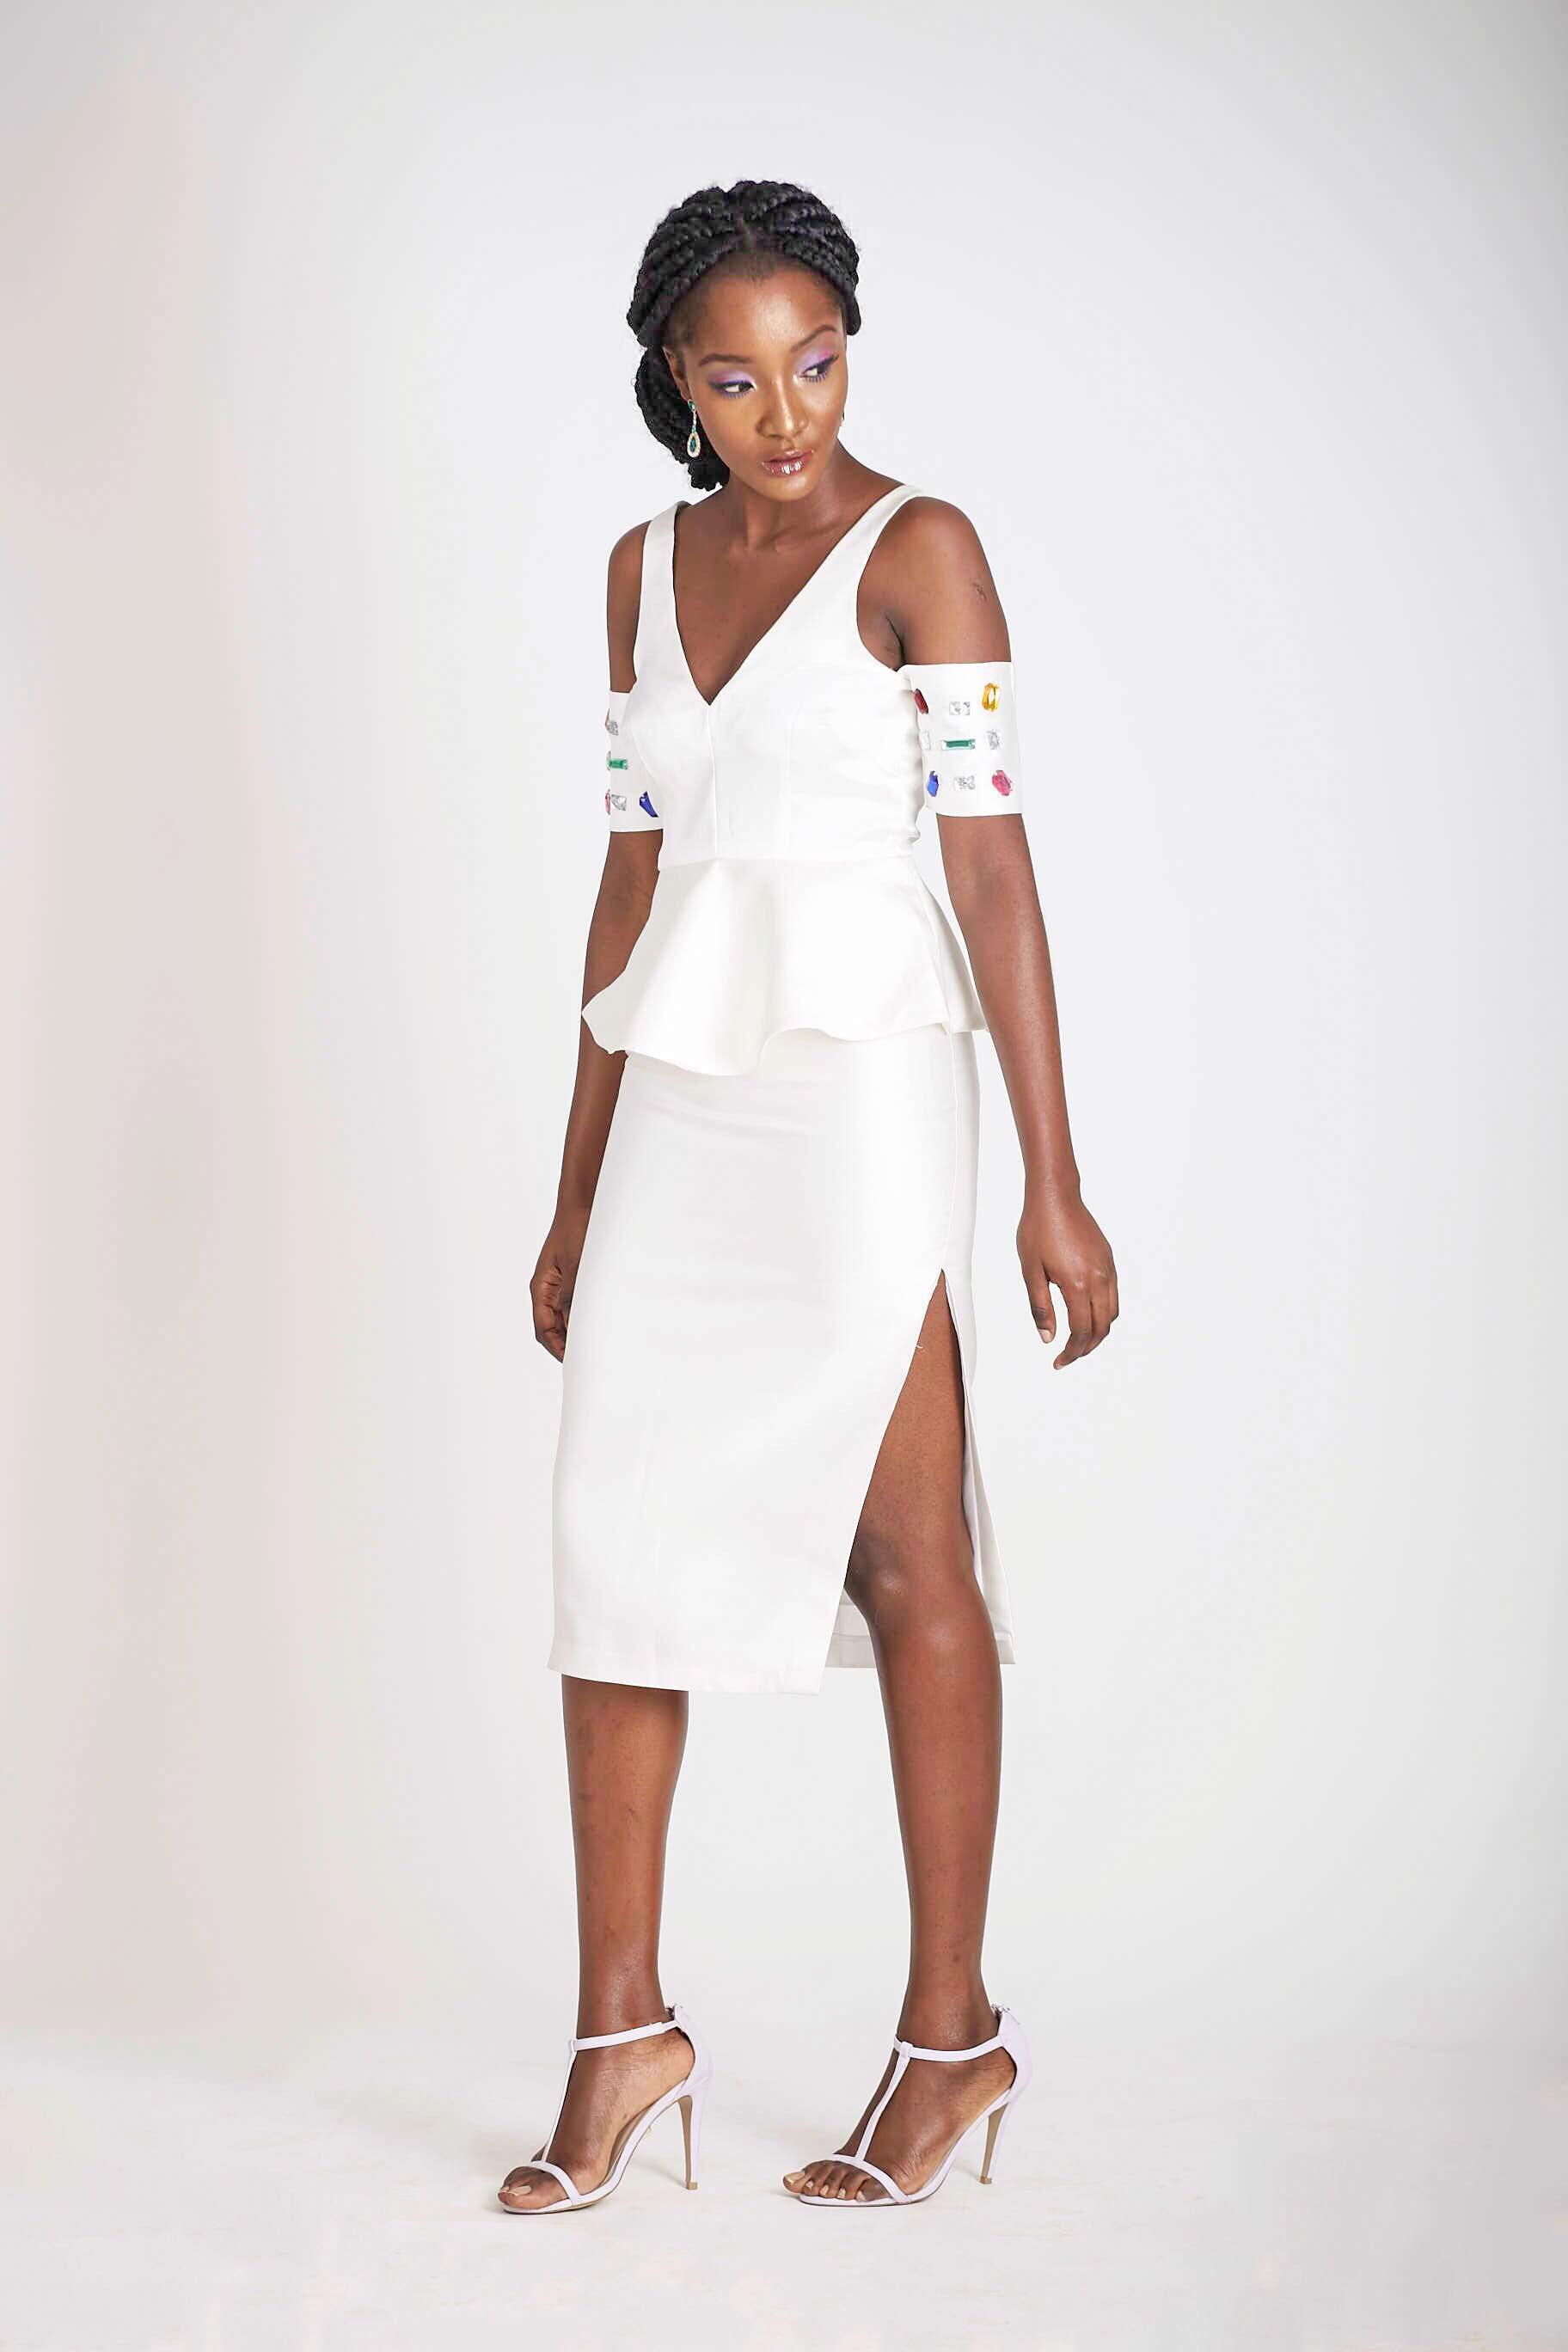 Imad Eduso - BN Style - Collection Lookbook - BellaNaija.com 04